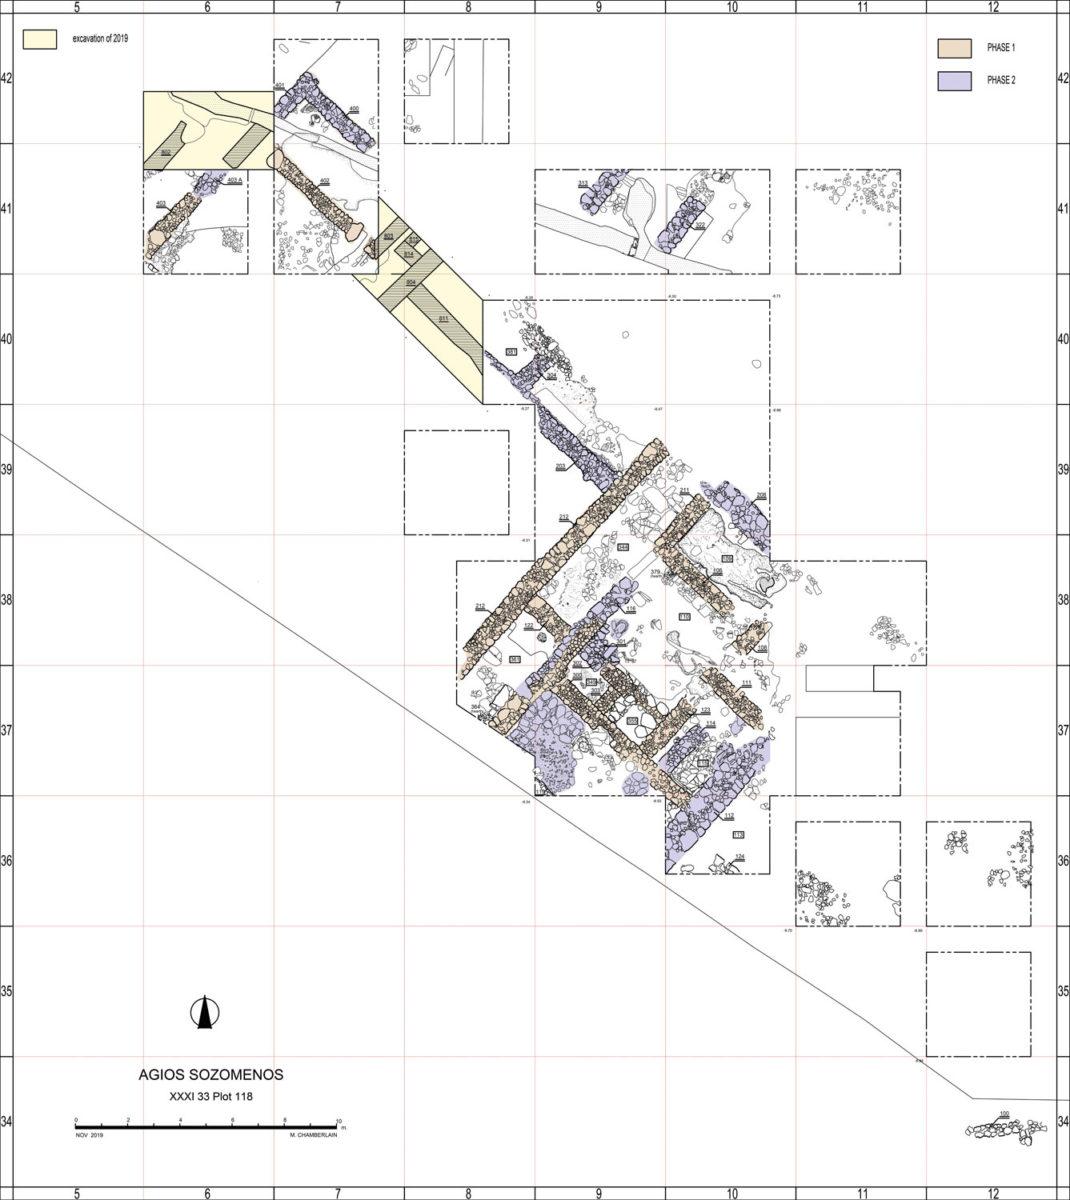 Excavation plan of Agios Sozomenos.